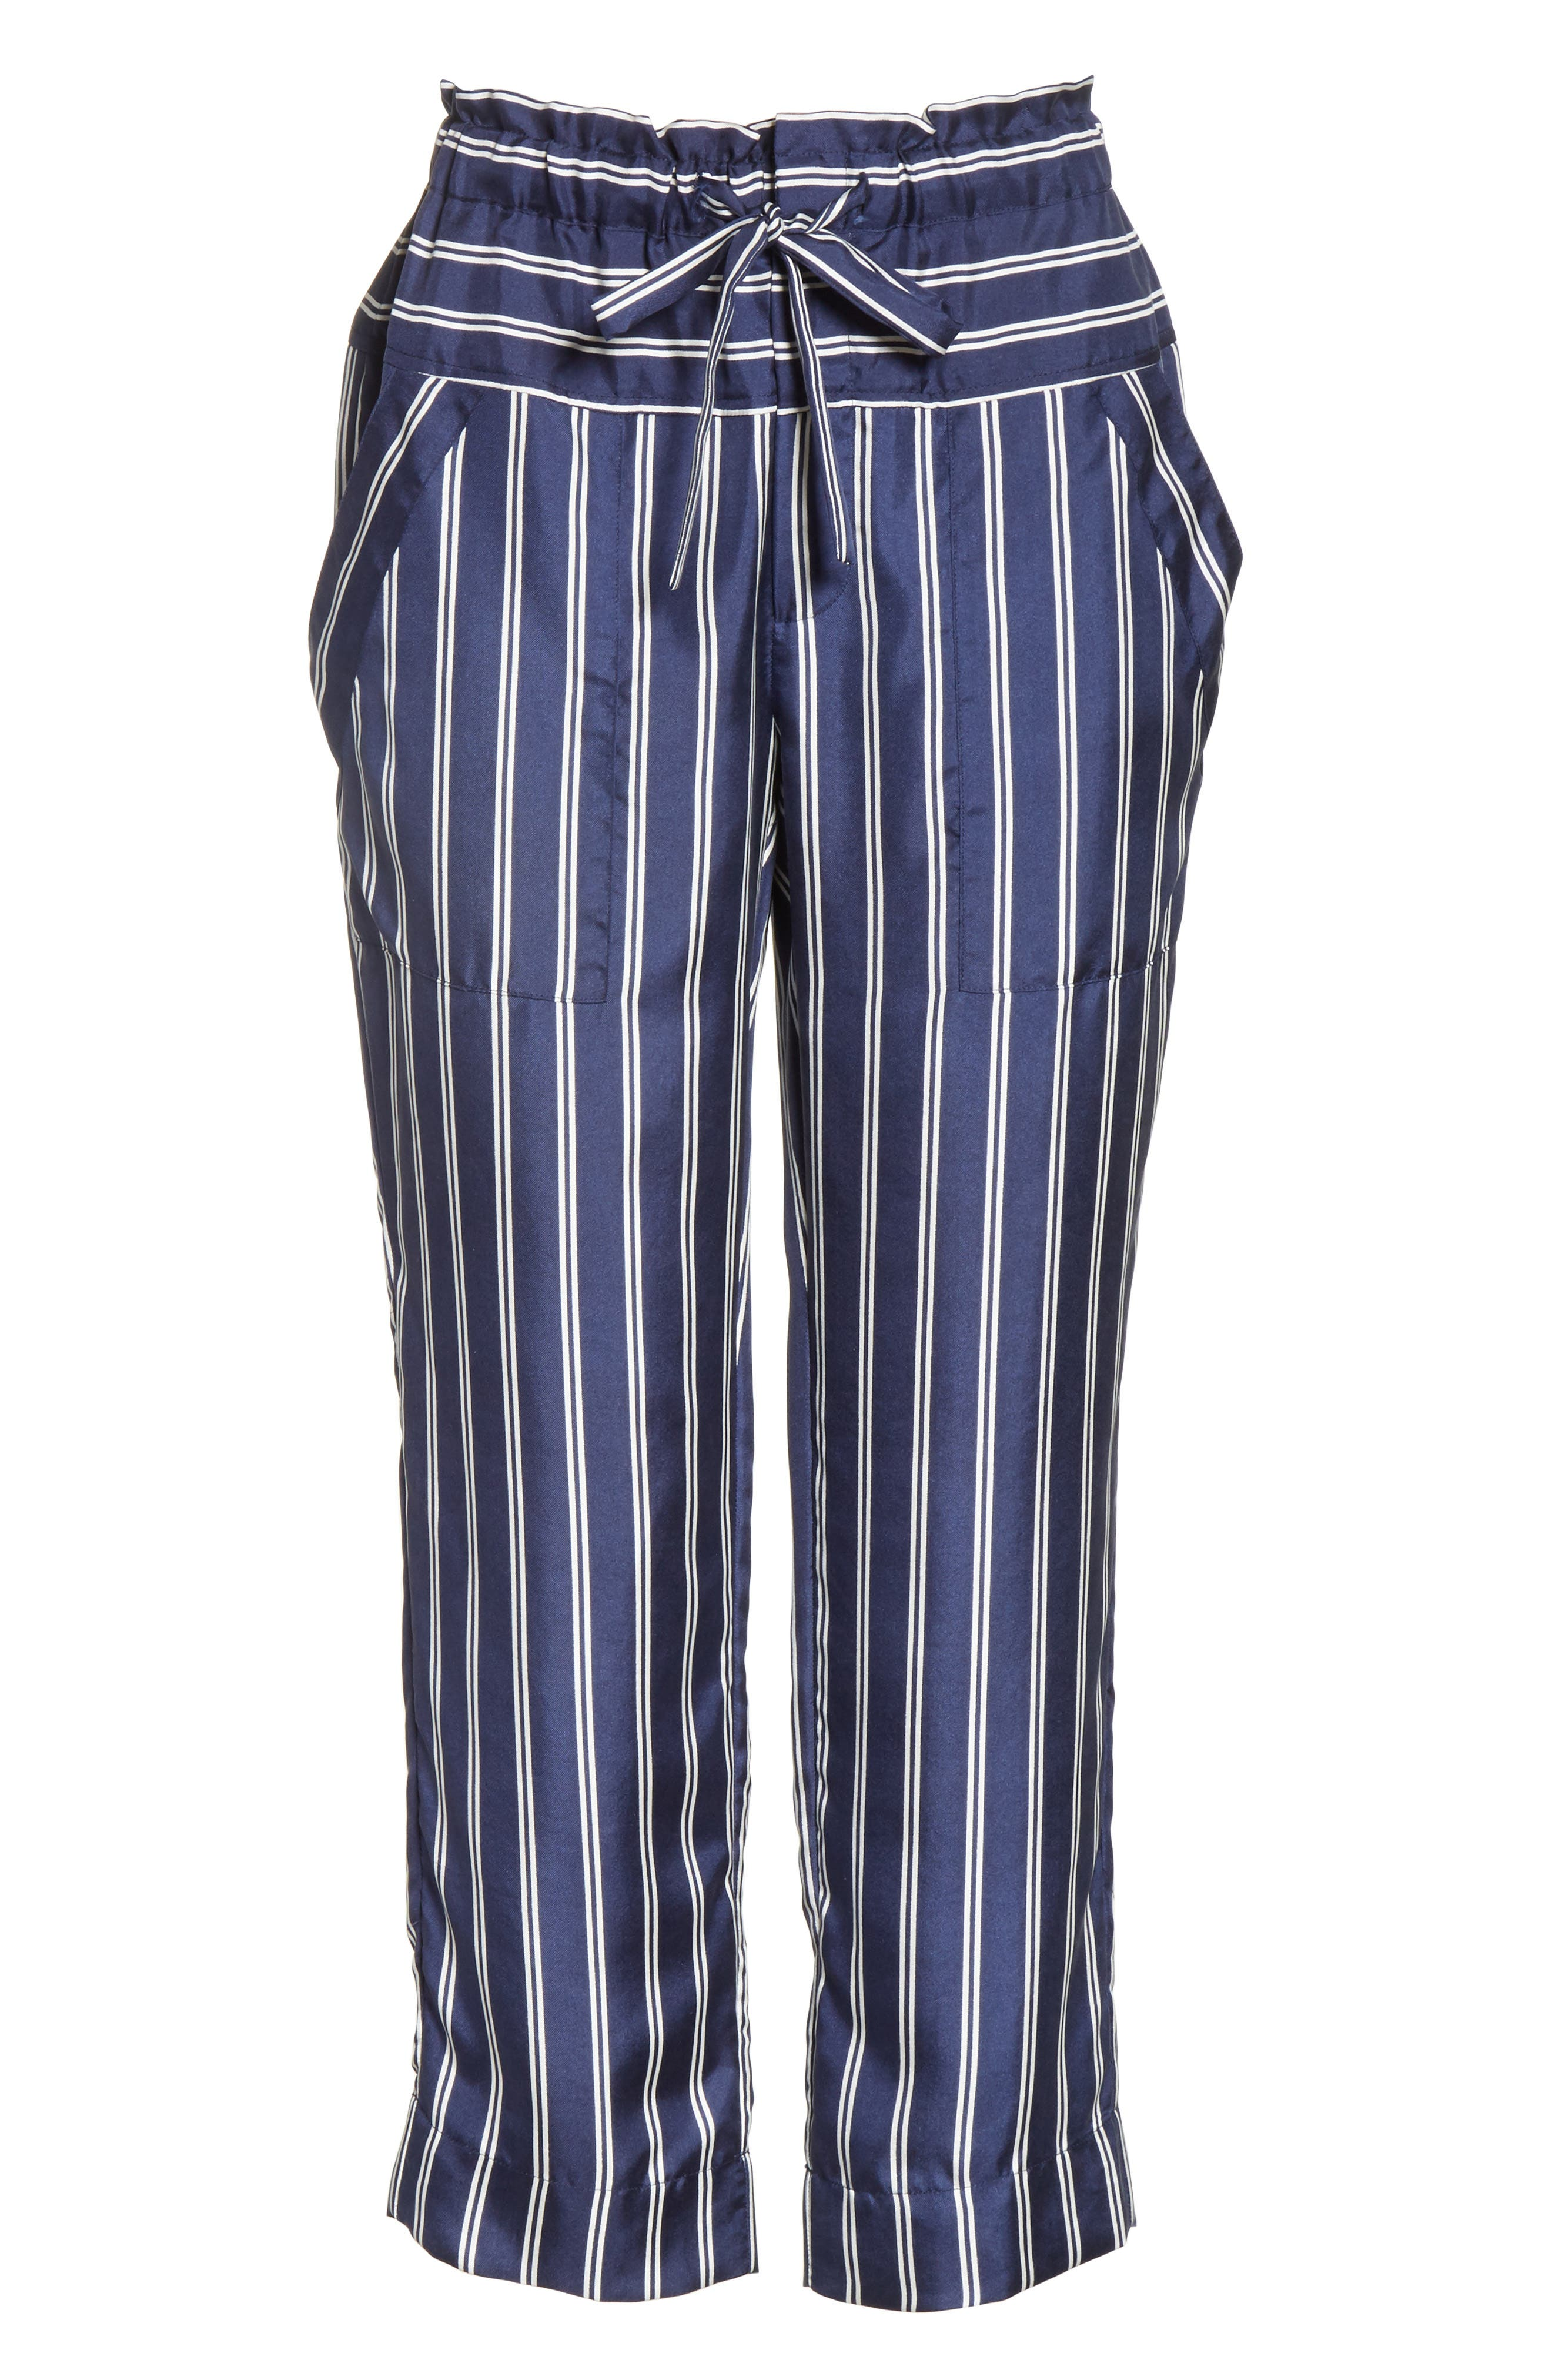 Addiena Stripe Silk Pants,                             Alternate thumbnail 6, color,                             Dark Navy